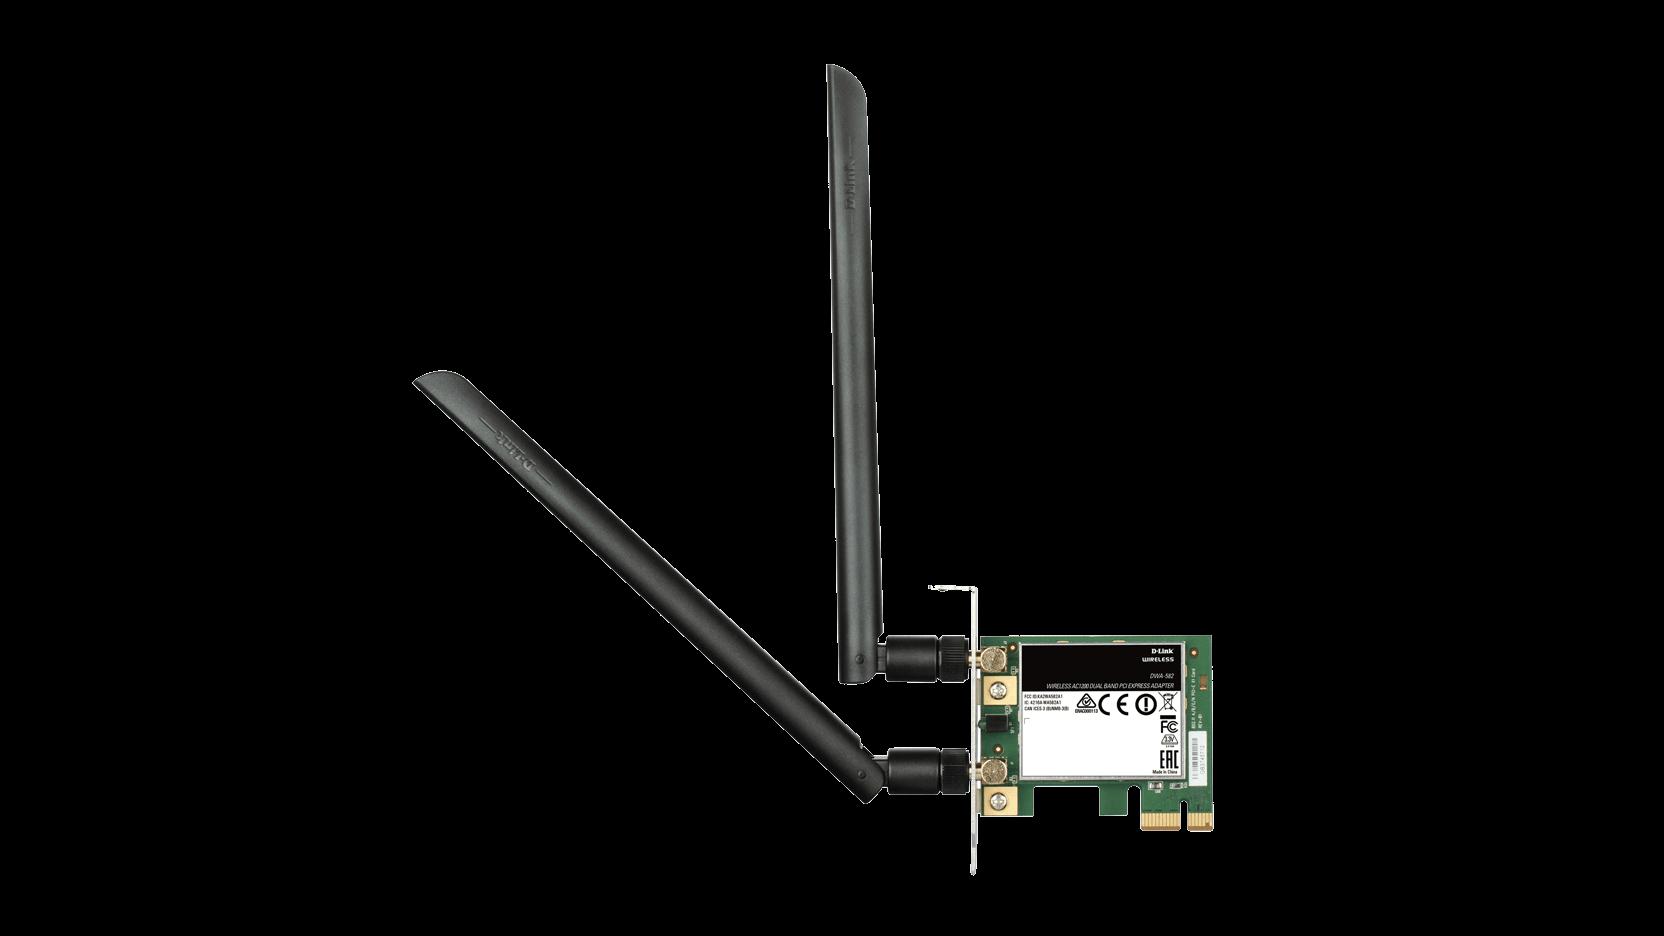 Dwa 192 Ac Ultra Wi Fi Usb Adapter